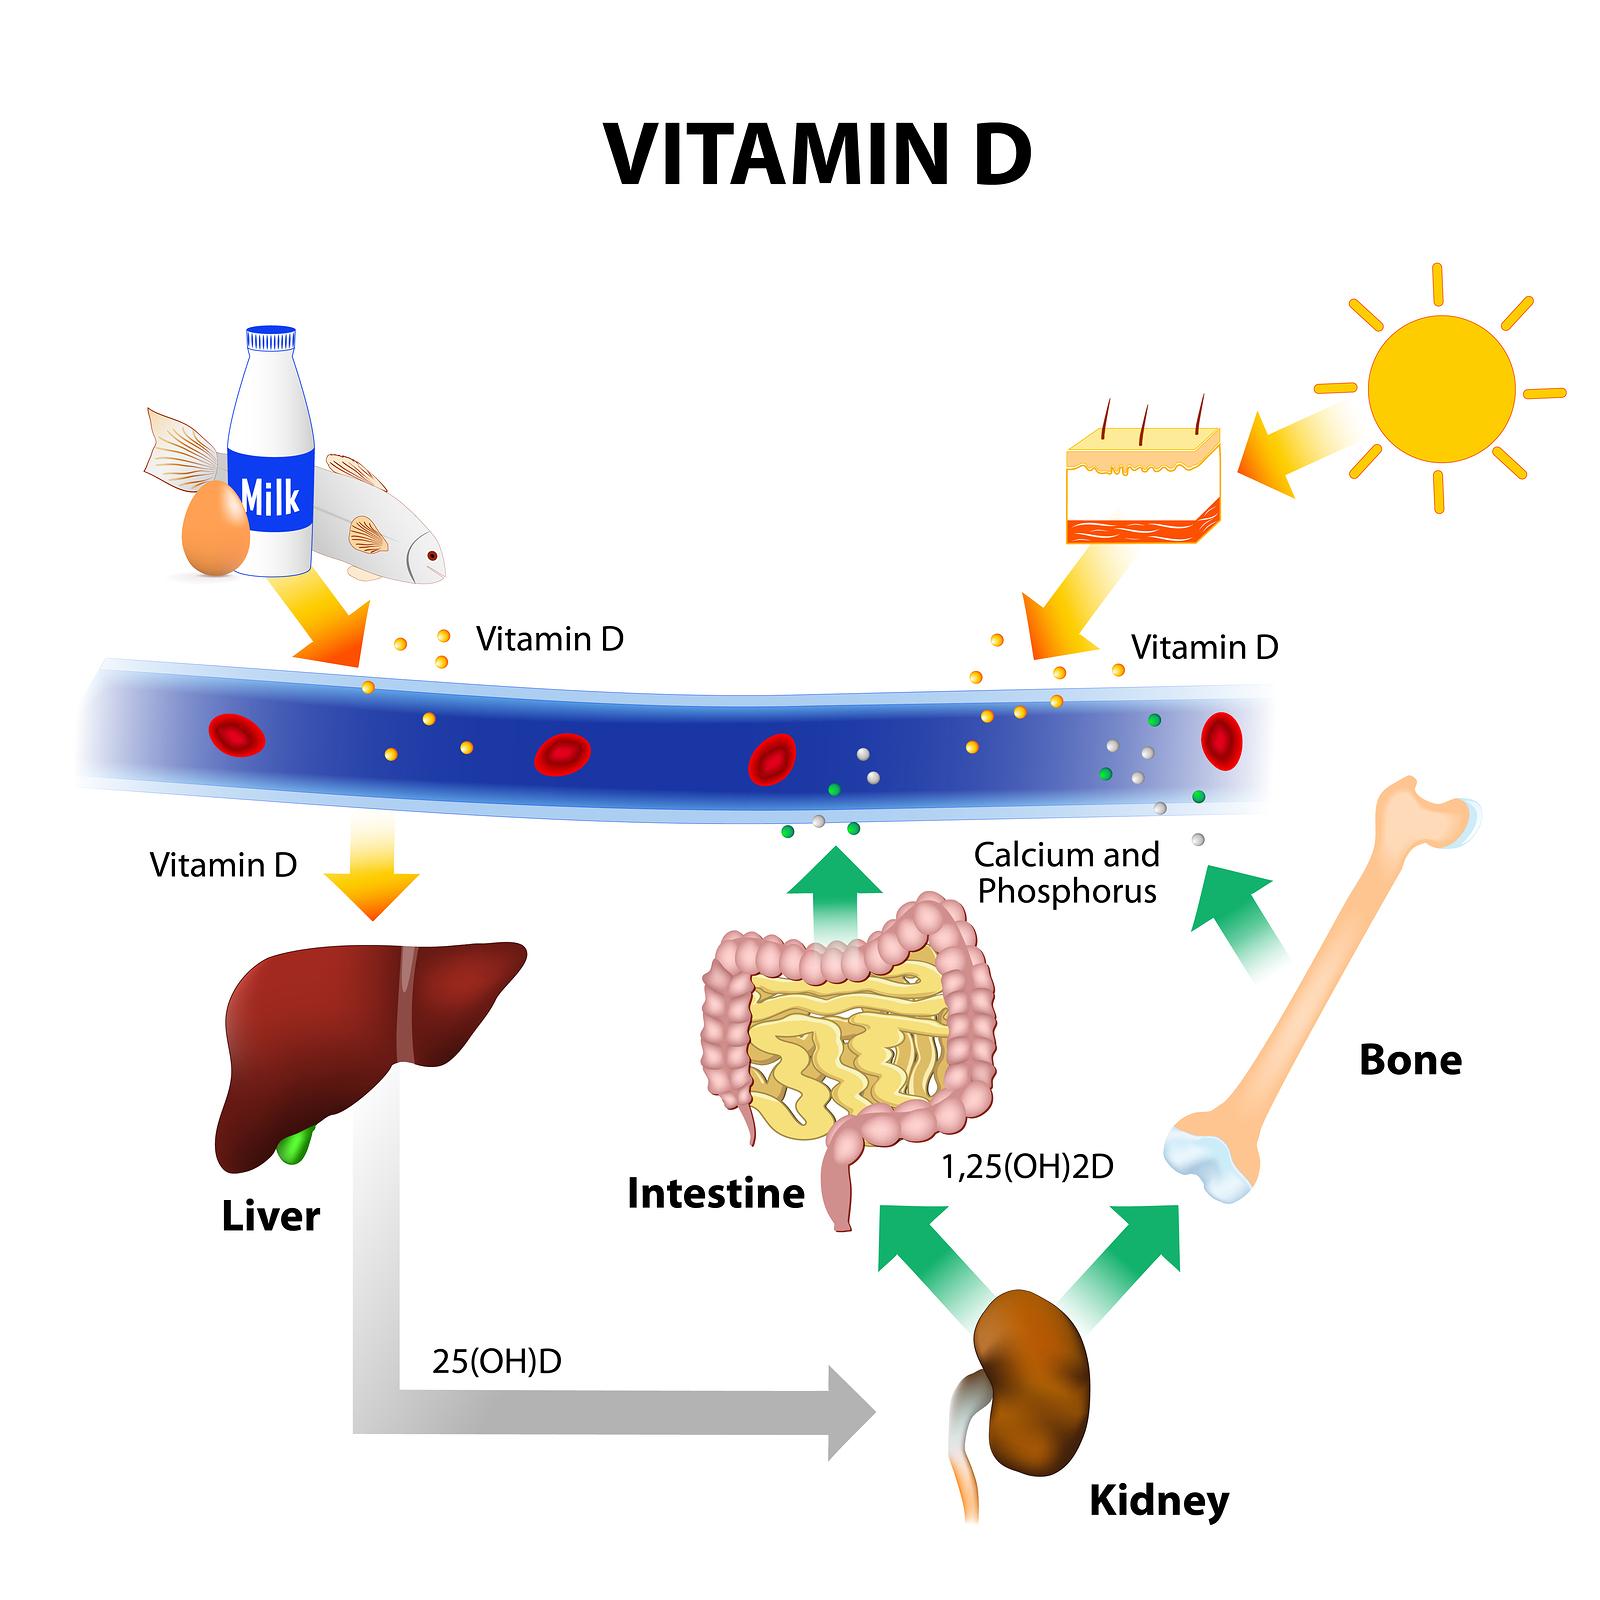 vitamin d - photo #29